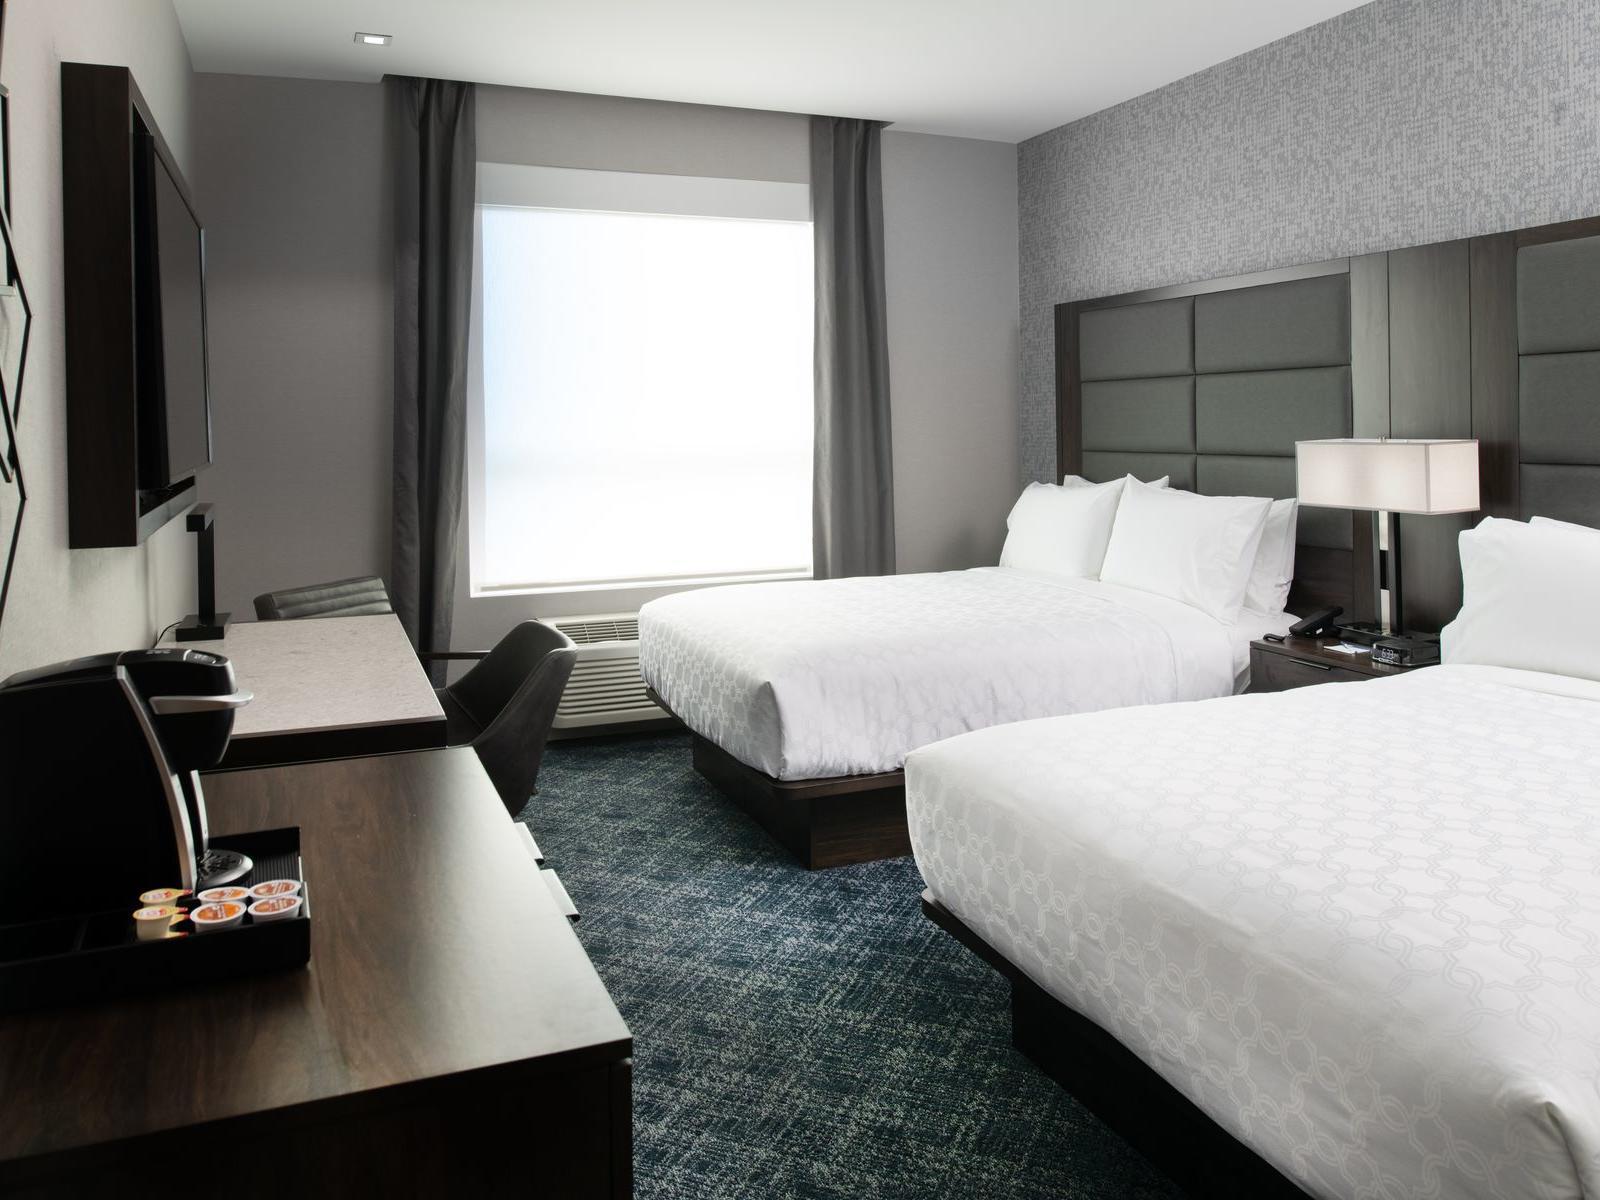 two queen beds facing tv in modern hotel room